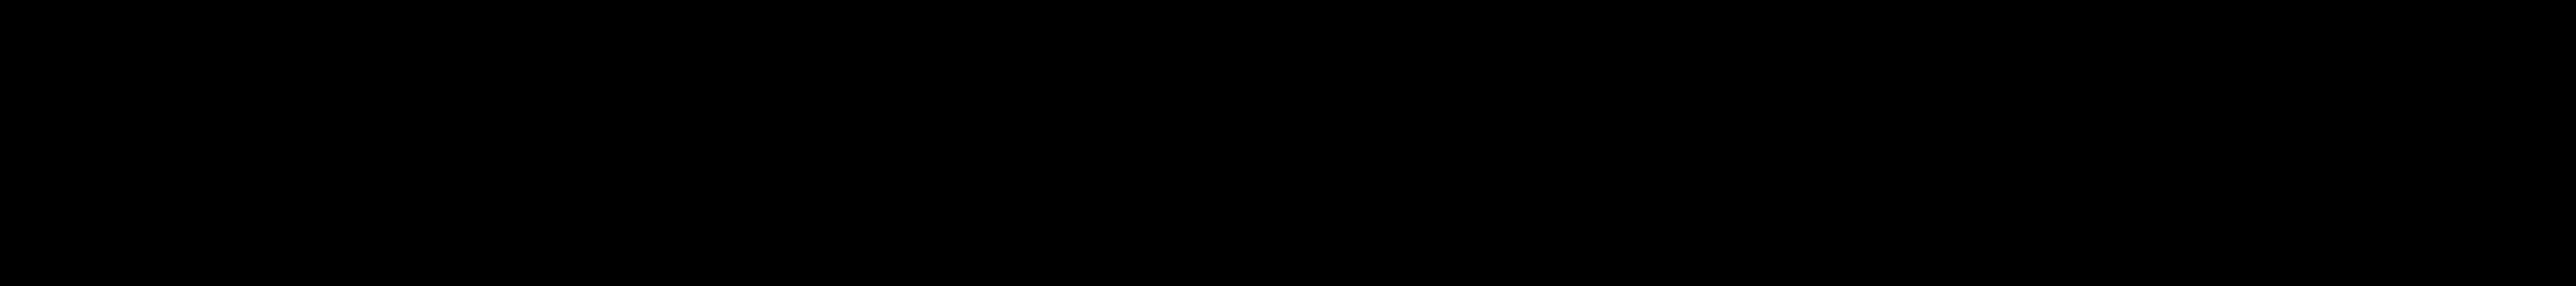 Dolce & Gabbana logo PNG images free download.